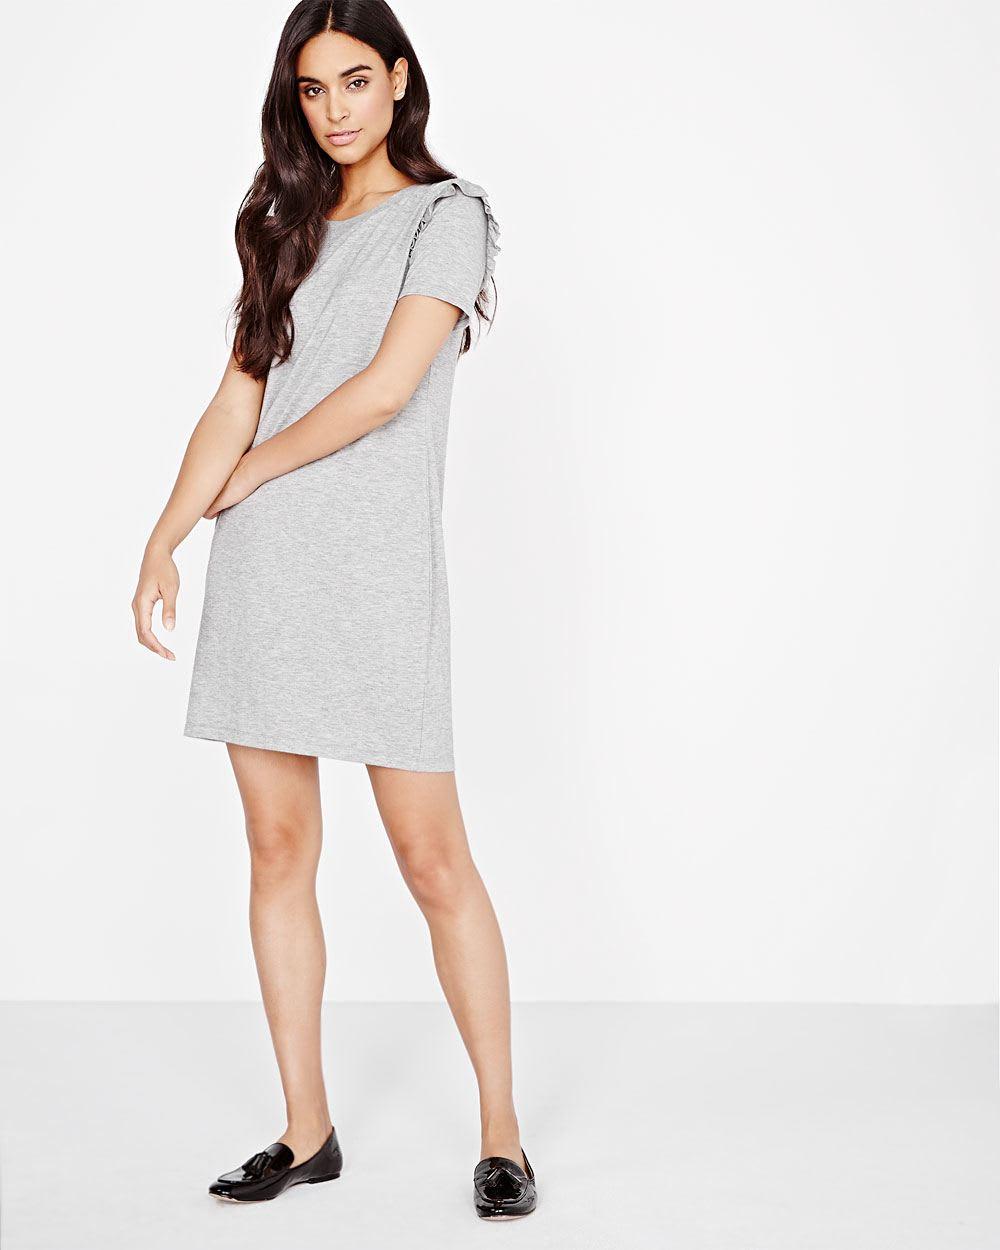 09ace839d132 Short sleeve knit dress